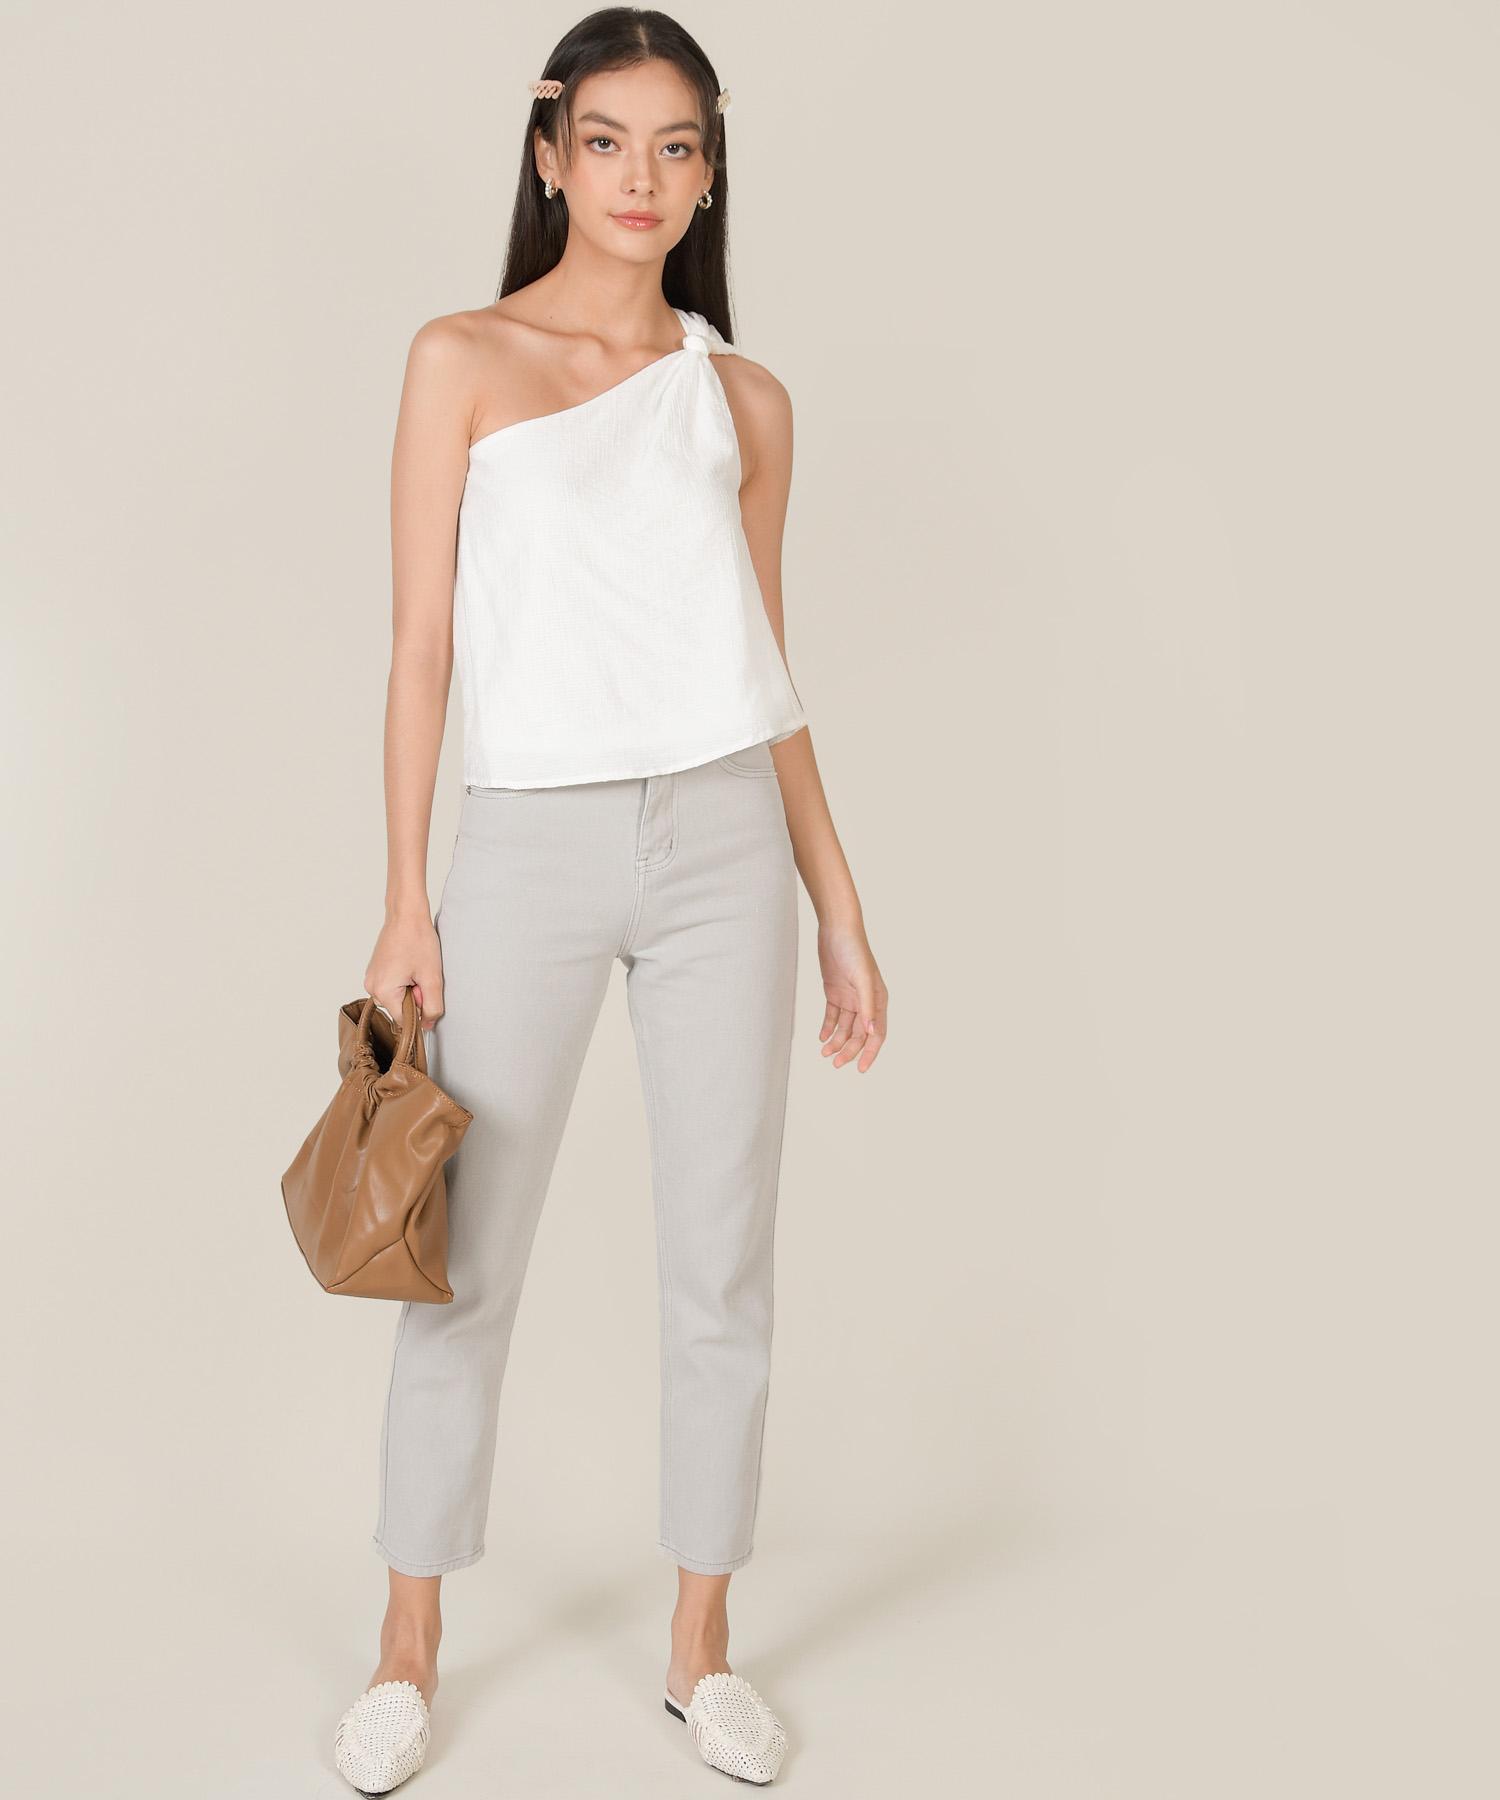 nilssen-skinny-jeans-pale-grey-1